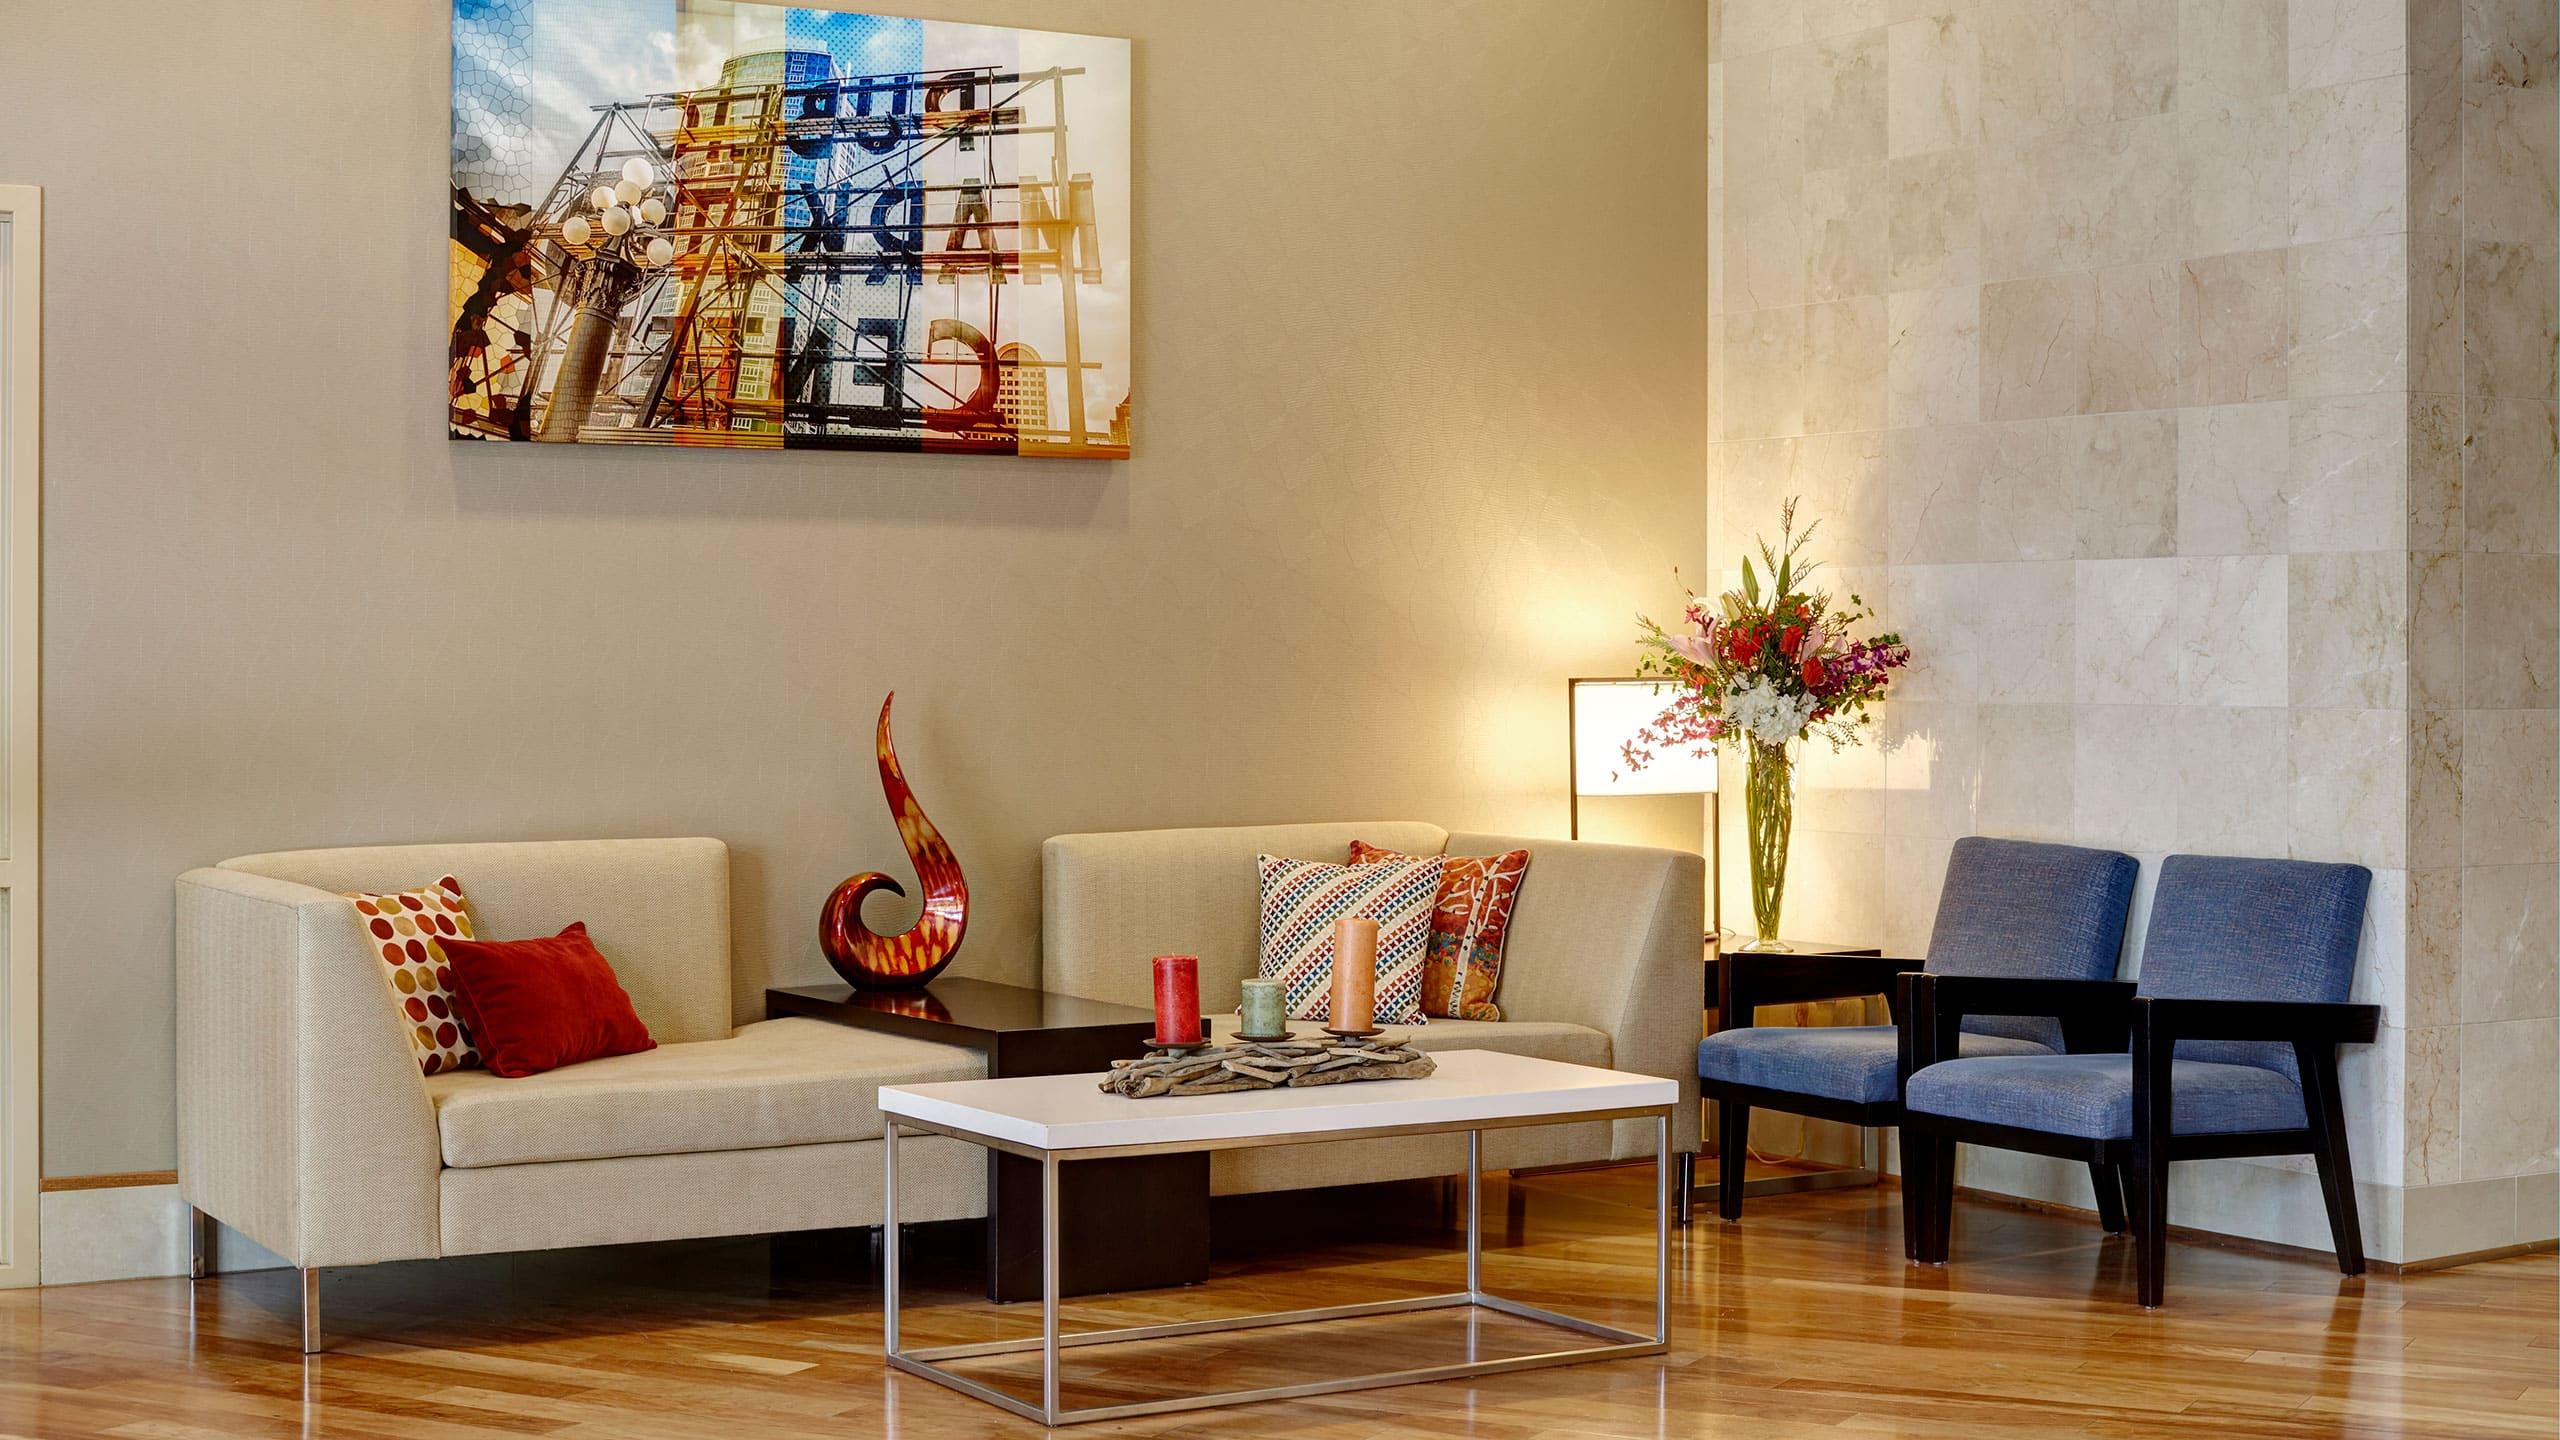 Extended Stay Hotel Rooms Bellevue, WA   Hyatt House ...